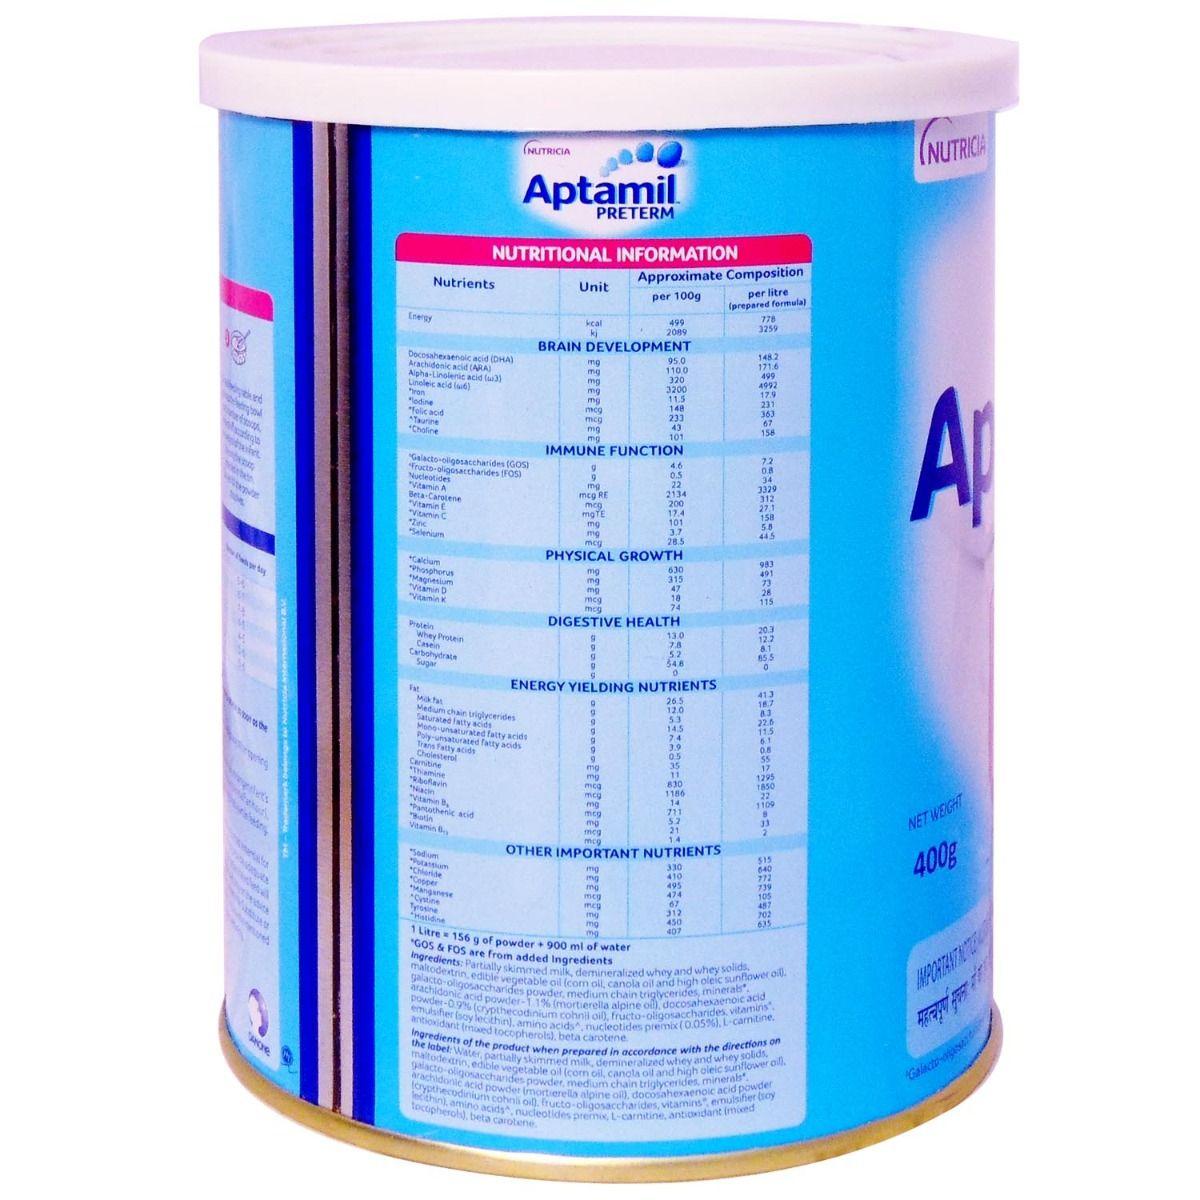 Aptamil Preterm Infant Formula, 400 gm Tin, Pack of 1